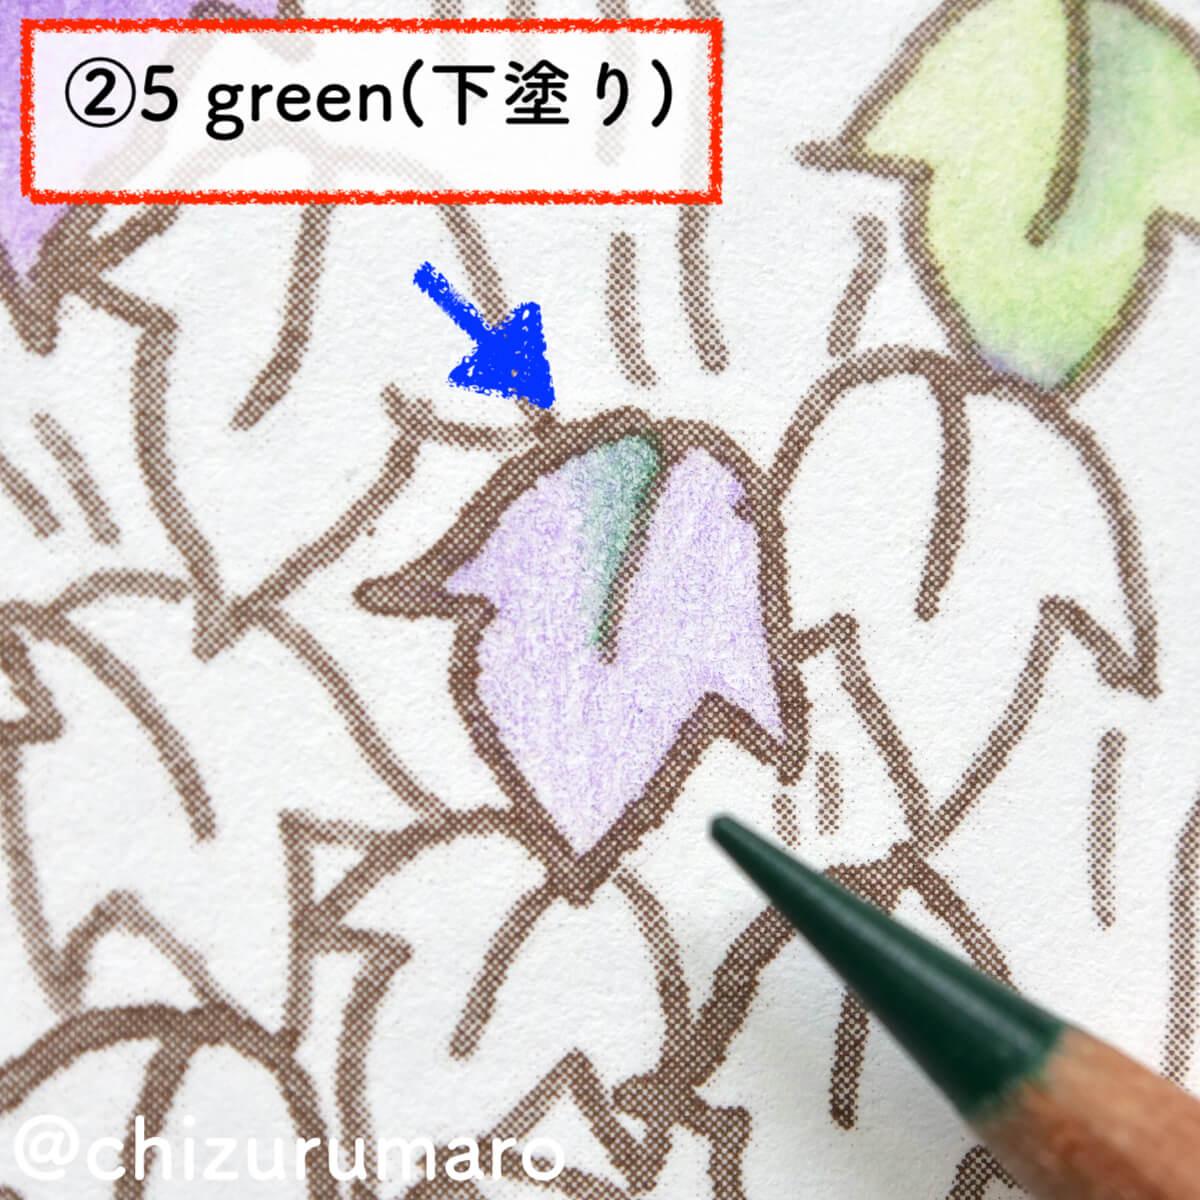 f:id:chizurumaro:20201119164805j:plain